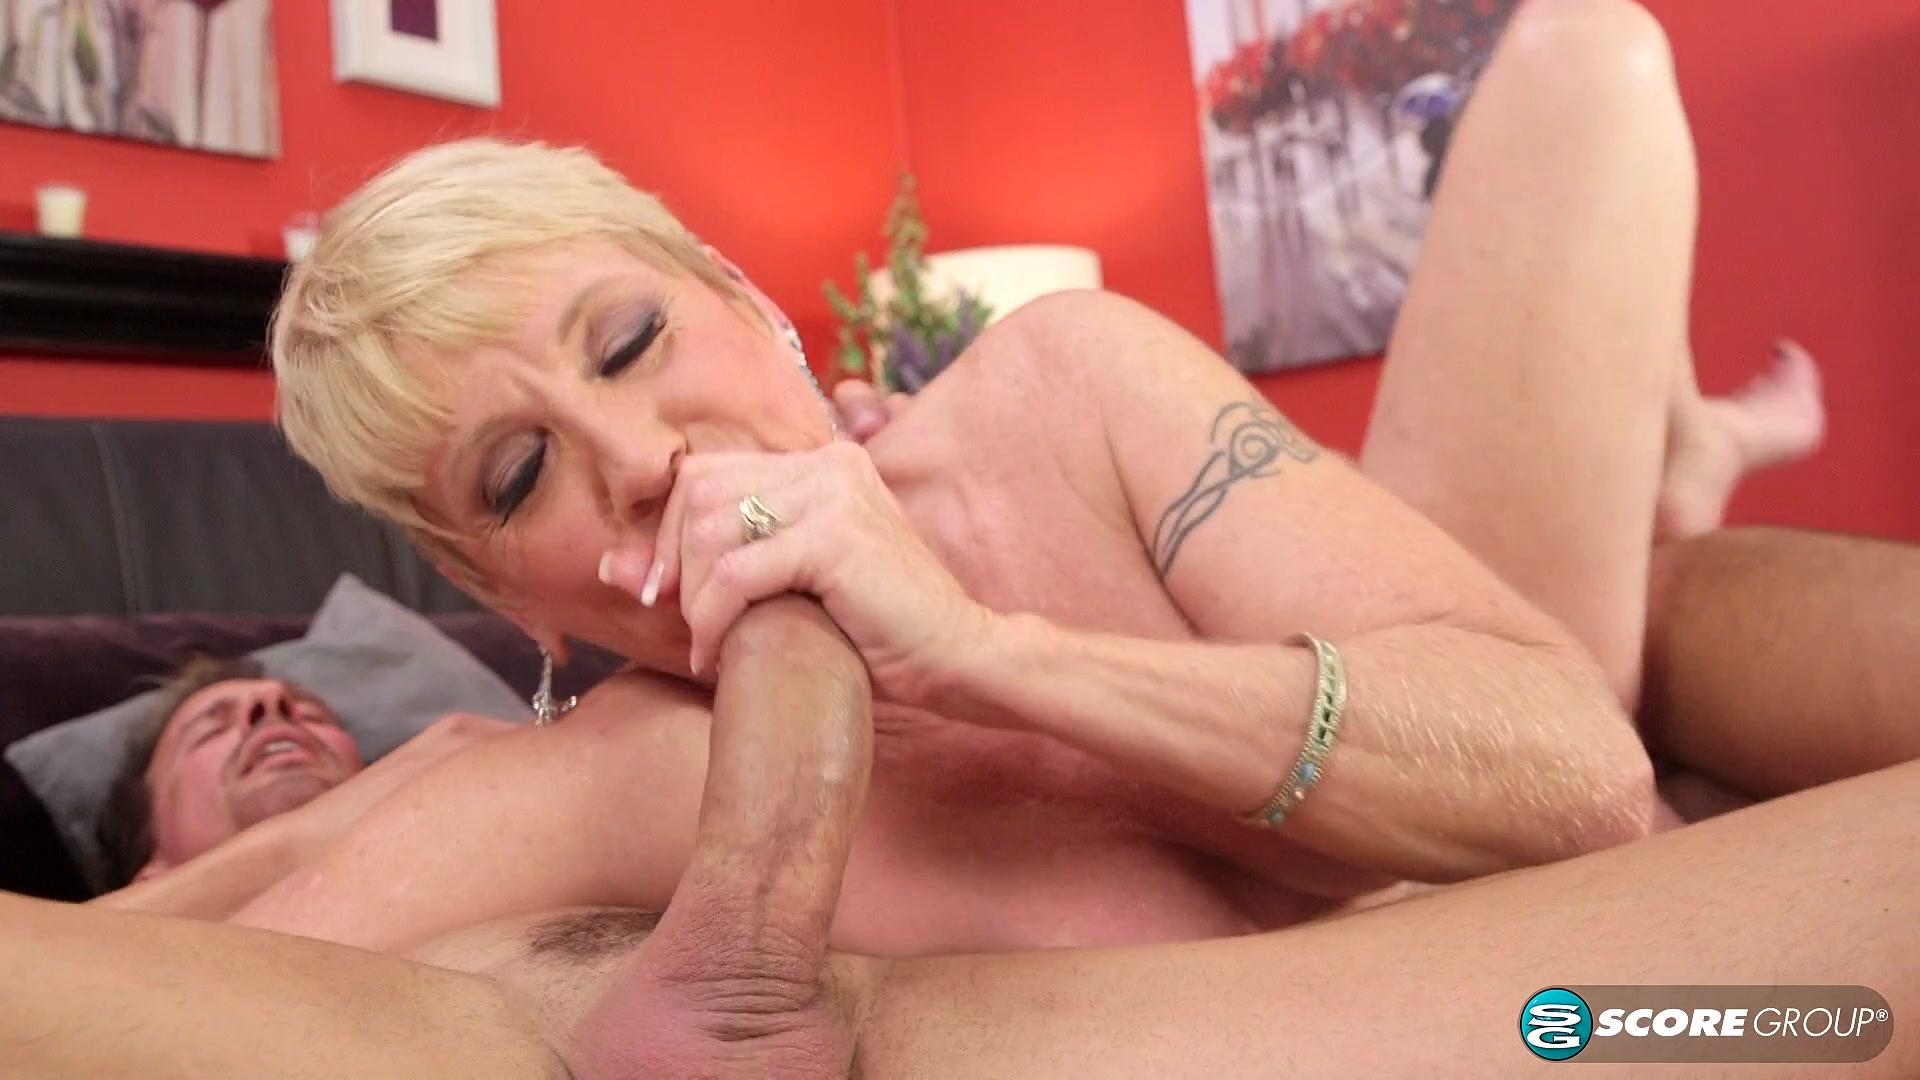 Любимую бабулю на даче онал порно видео фото 730-919